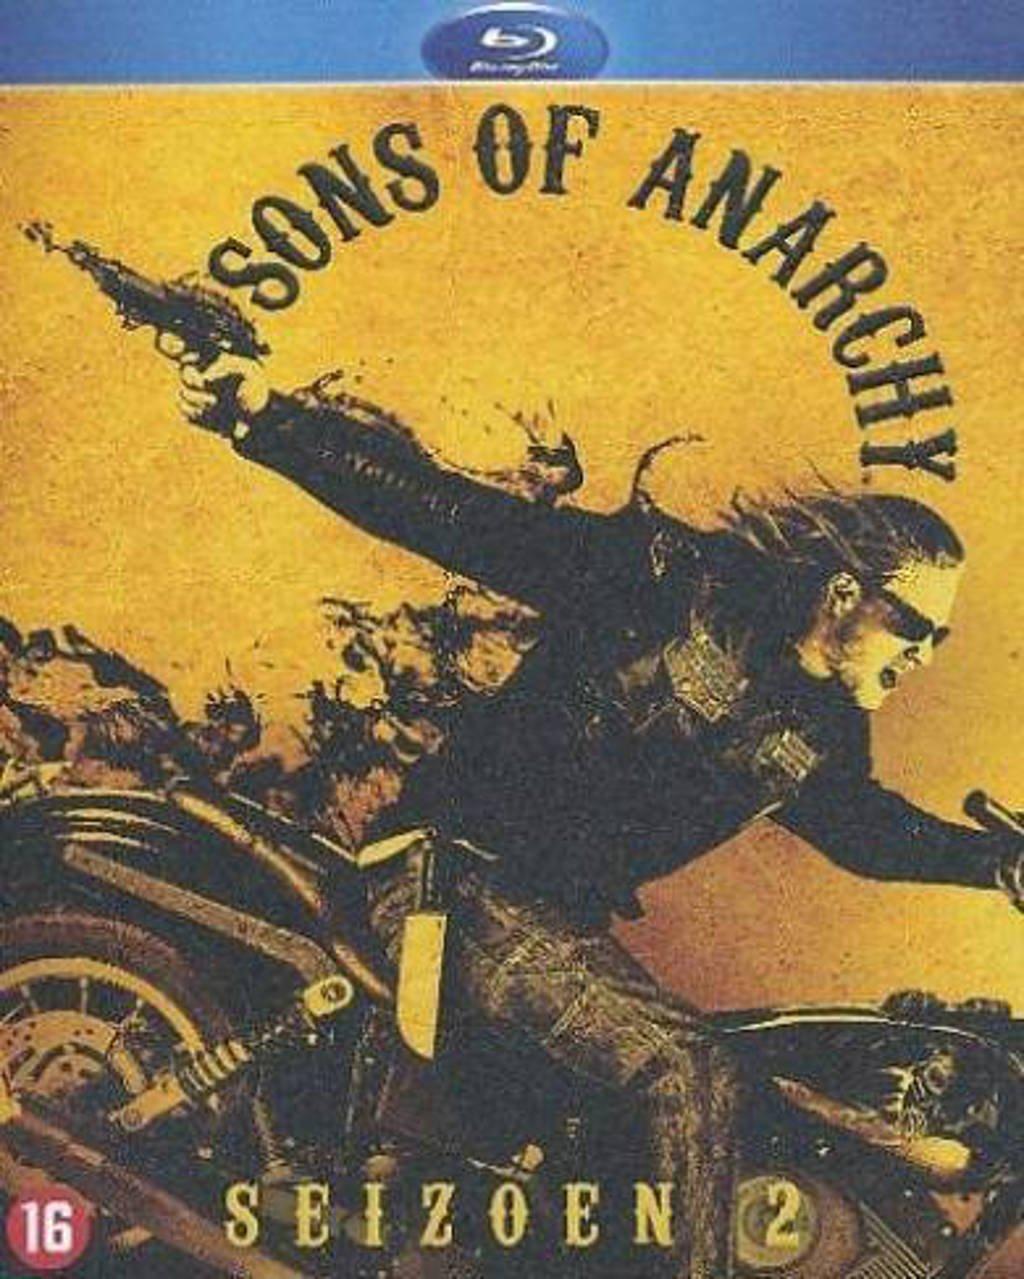 Sons of anarchy - Seizoen 2 (Blu-ray)